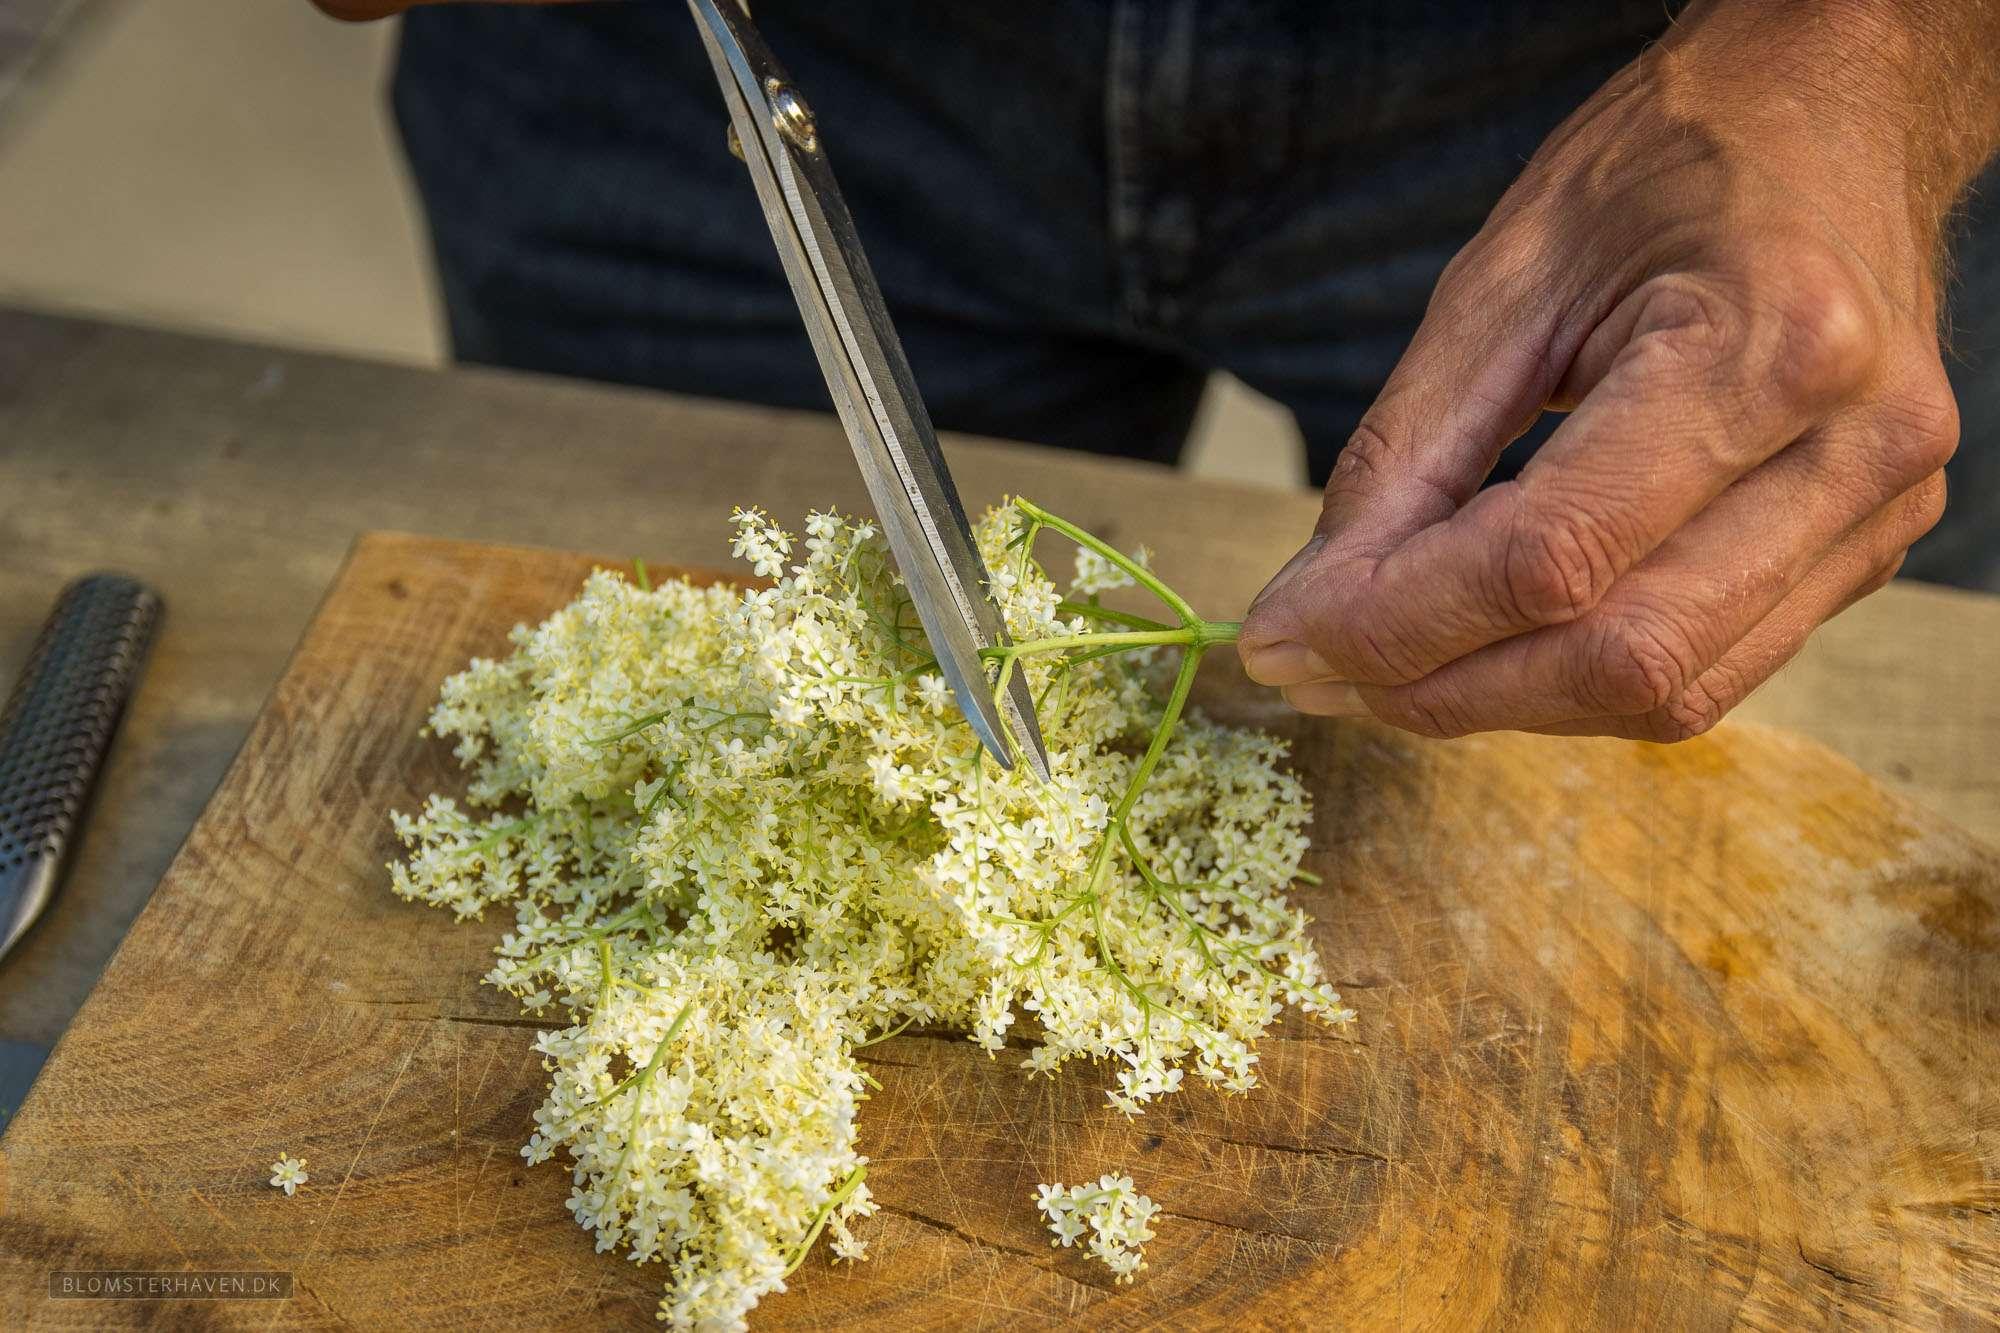 hyldeblomstskærmene klippes ud i mindre bidder til hjemmelavet hyldeblomst champagne